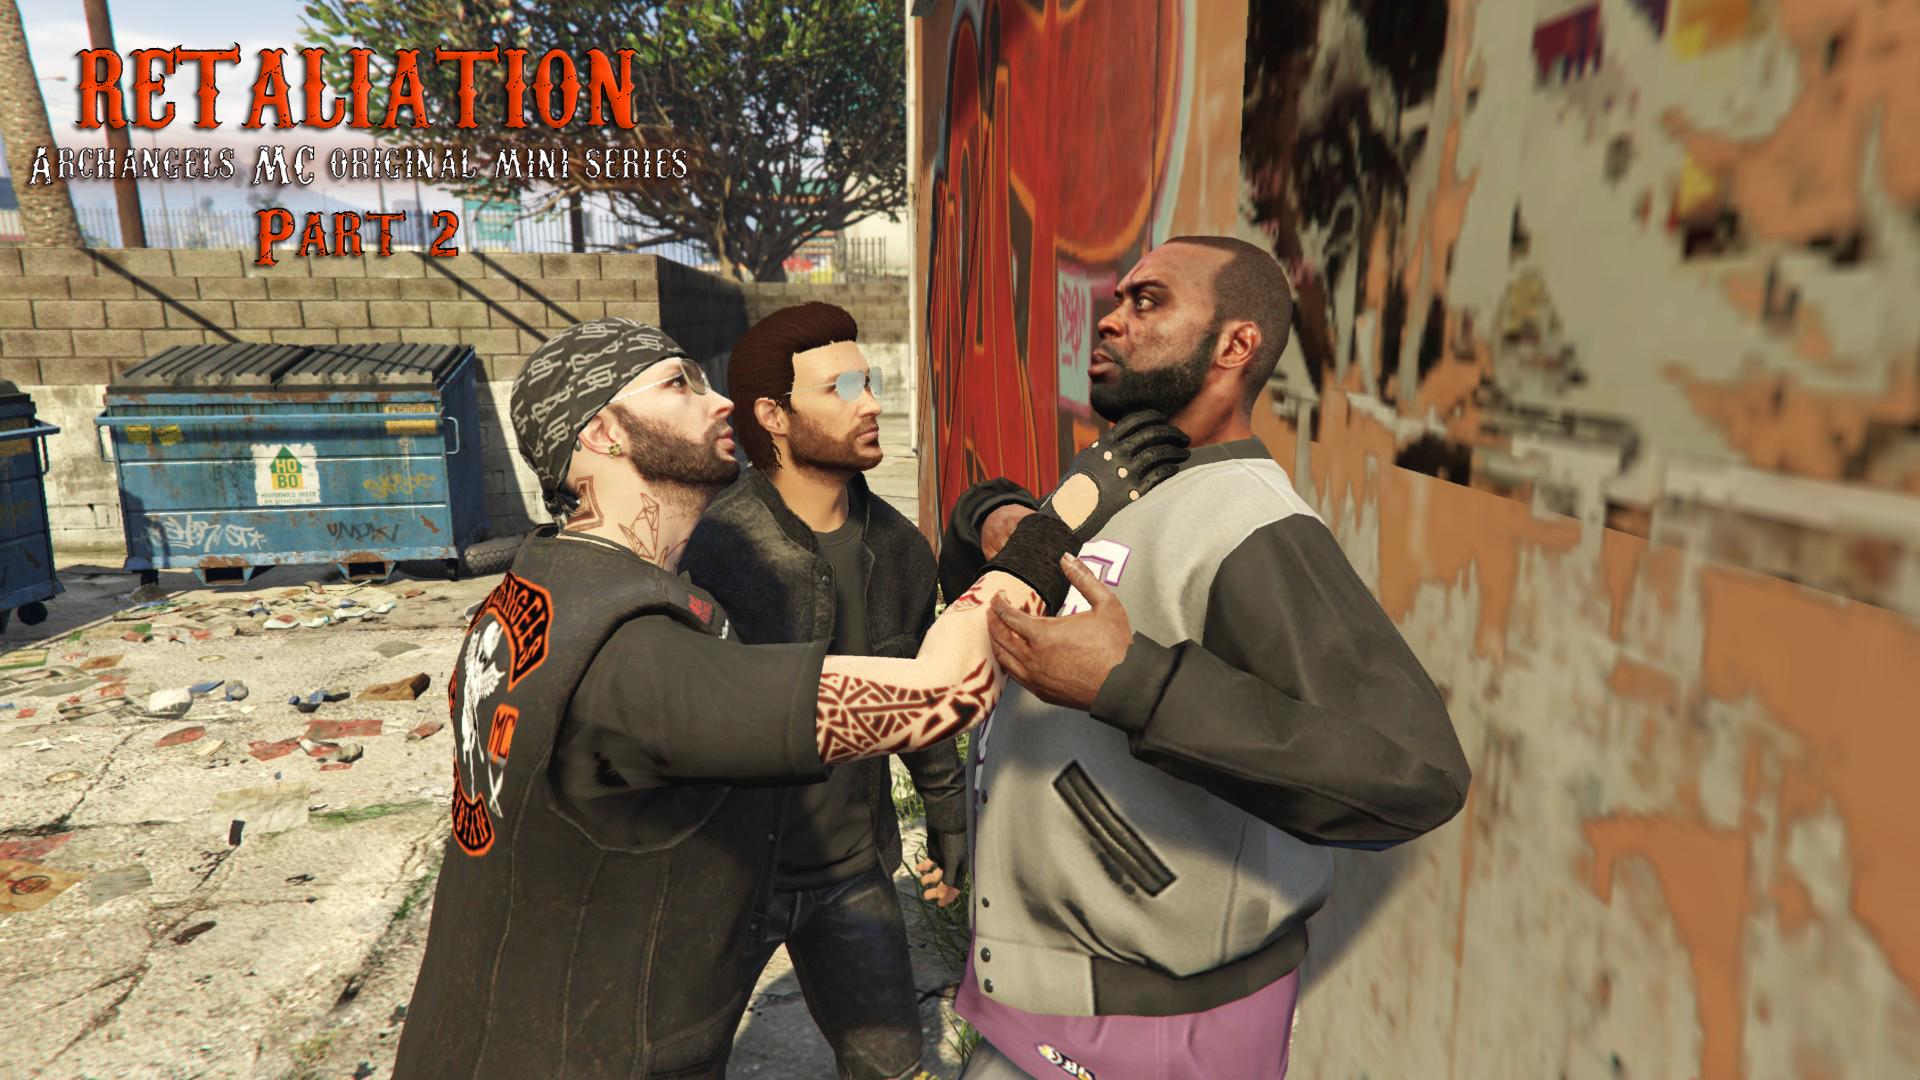 Retaliation_pt2_promo1.jpg